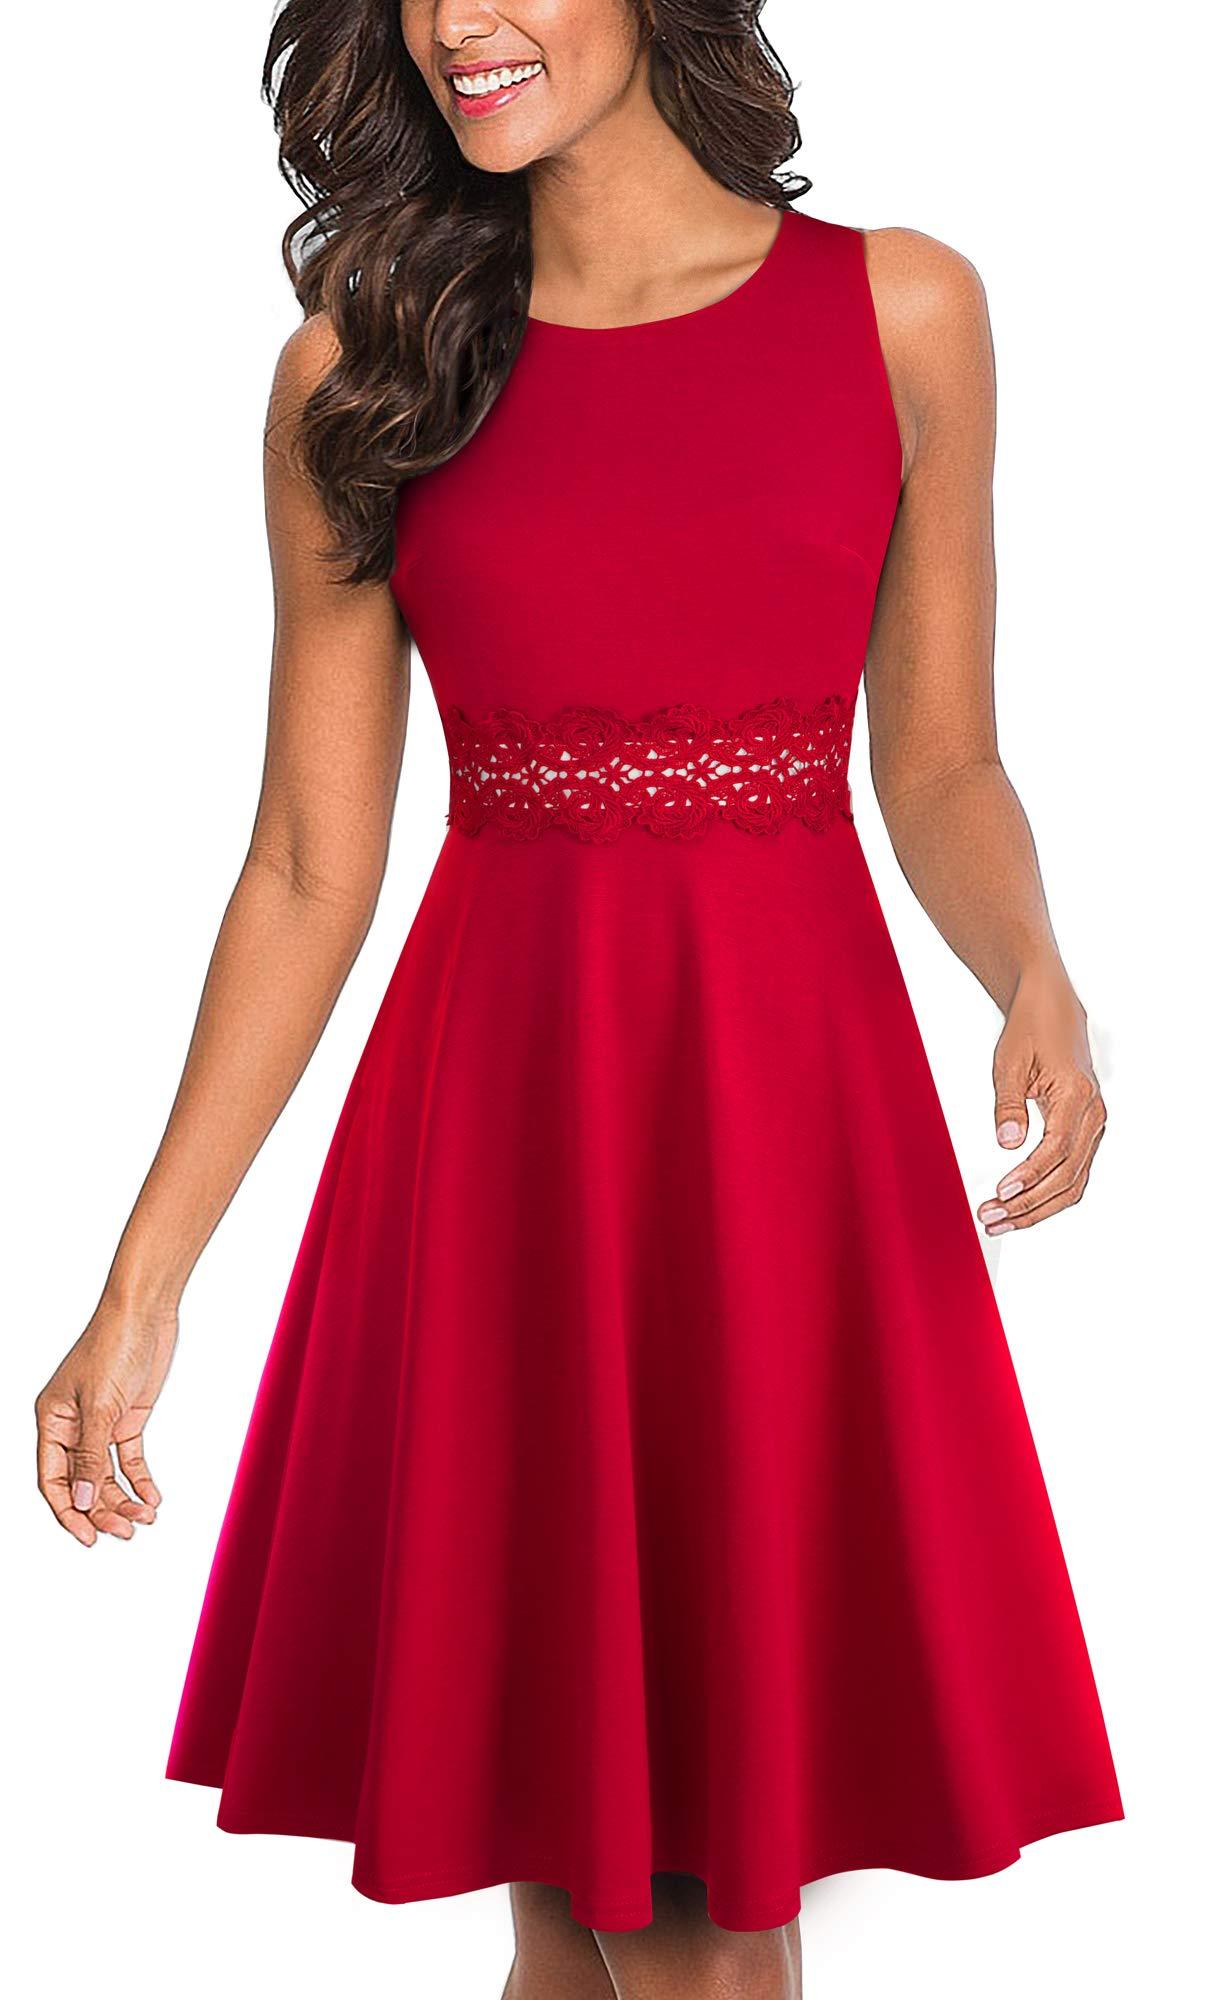 Red Dress - Women's Dress Sweet & Cute V-Neck Bell Sleeve Shift Dress Mini Dress